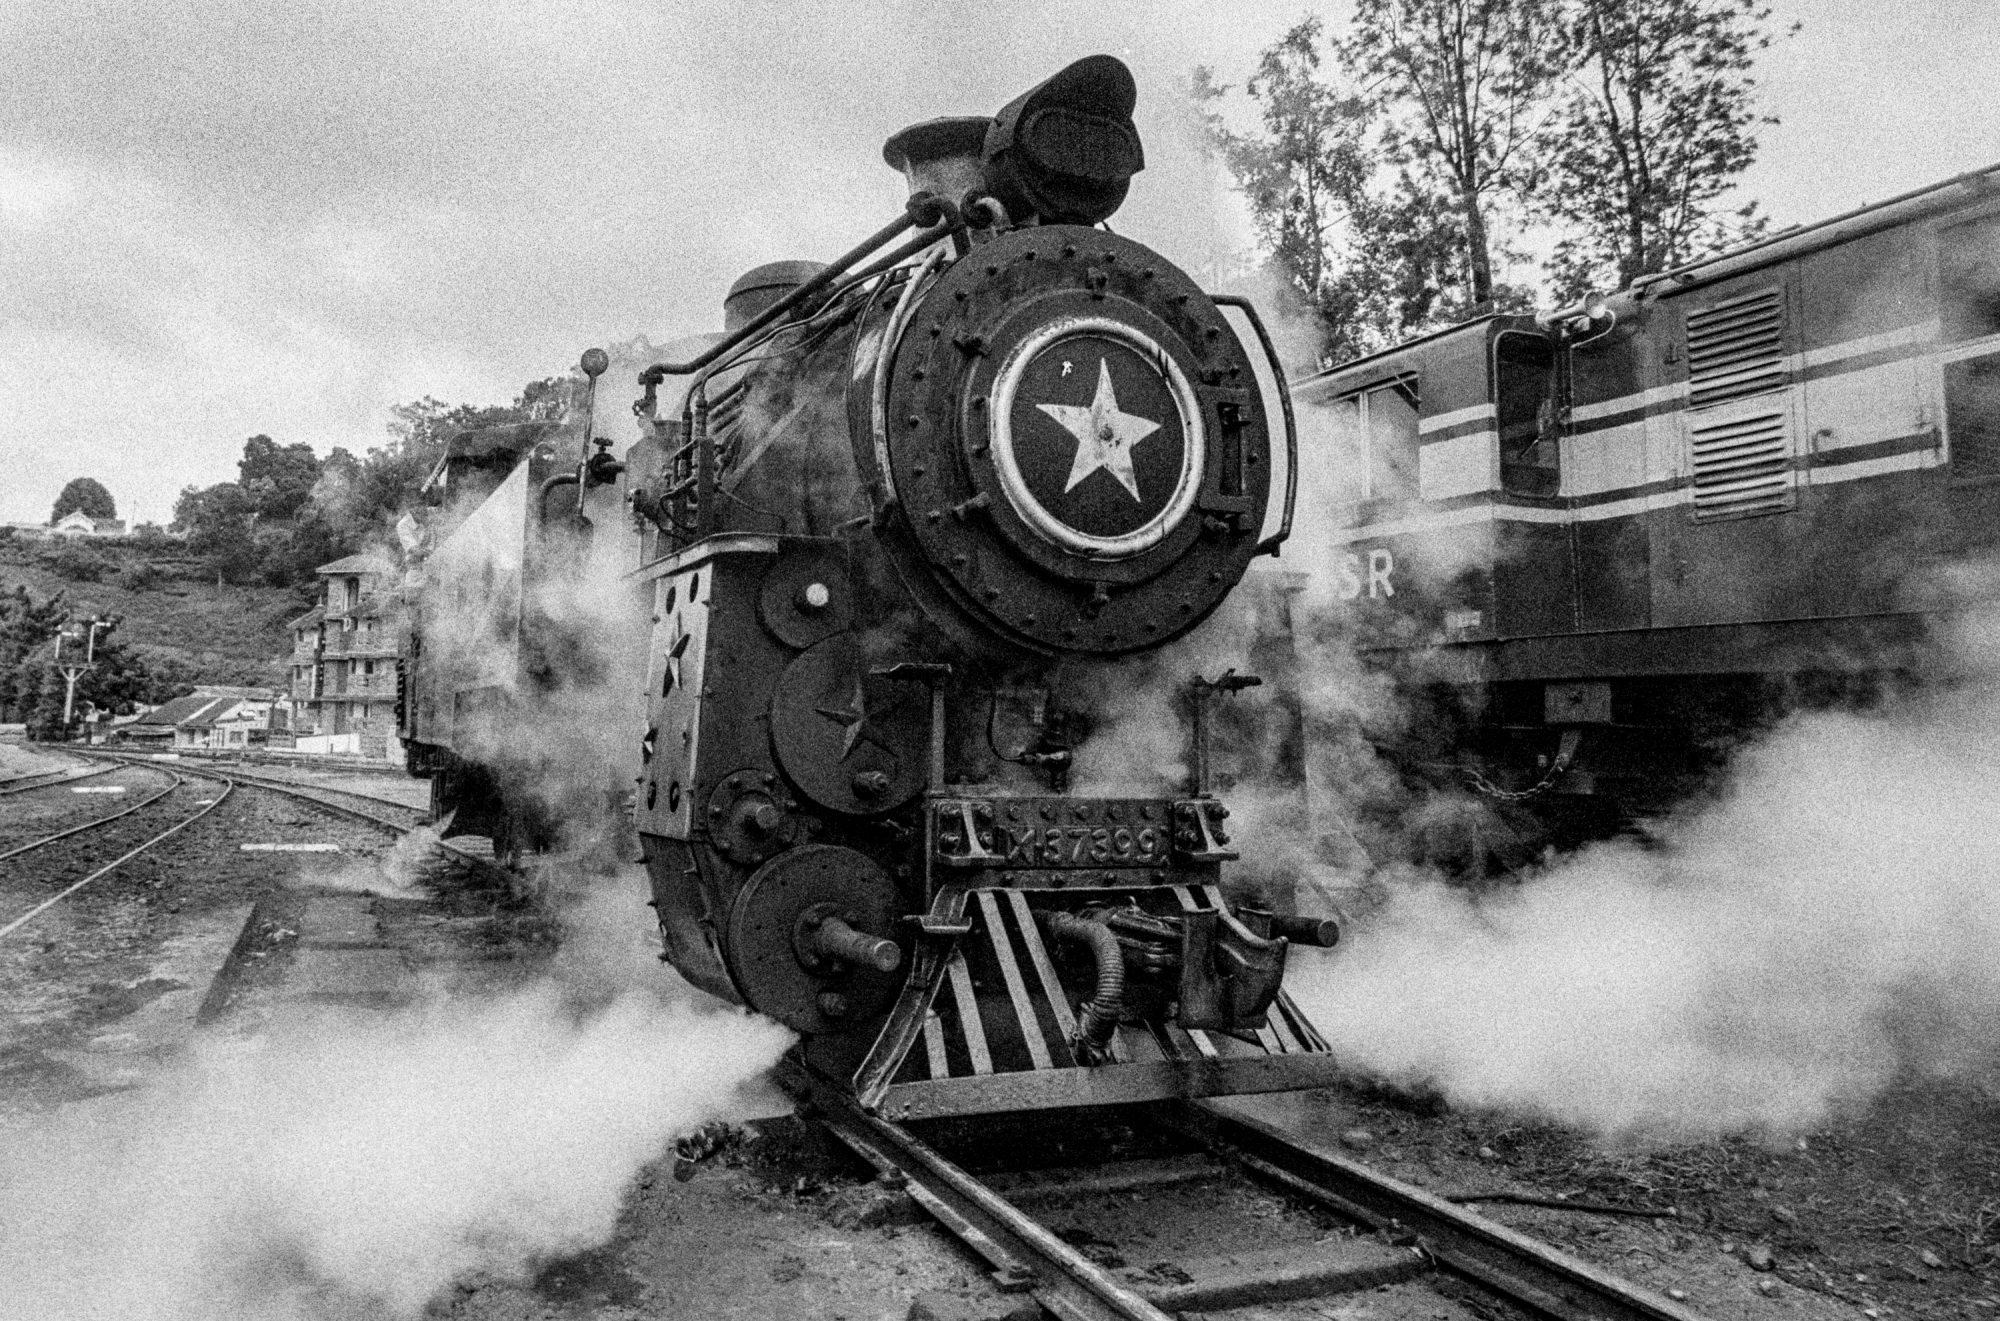 Steam train at station (Pic: Nandakumar Narasimhan)